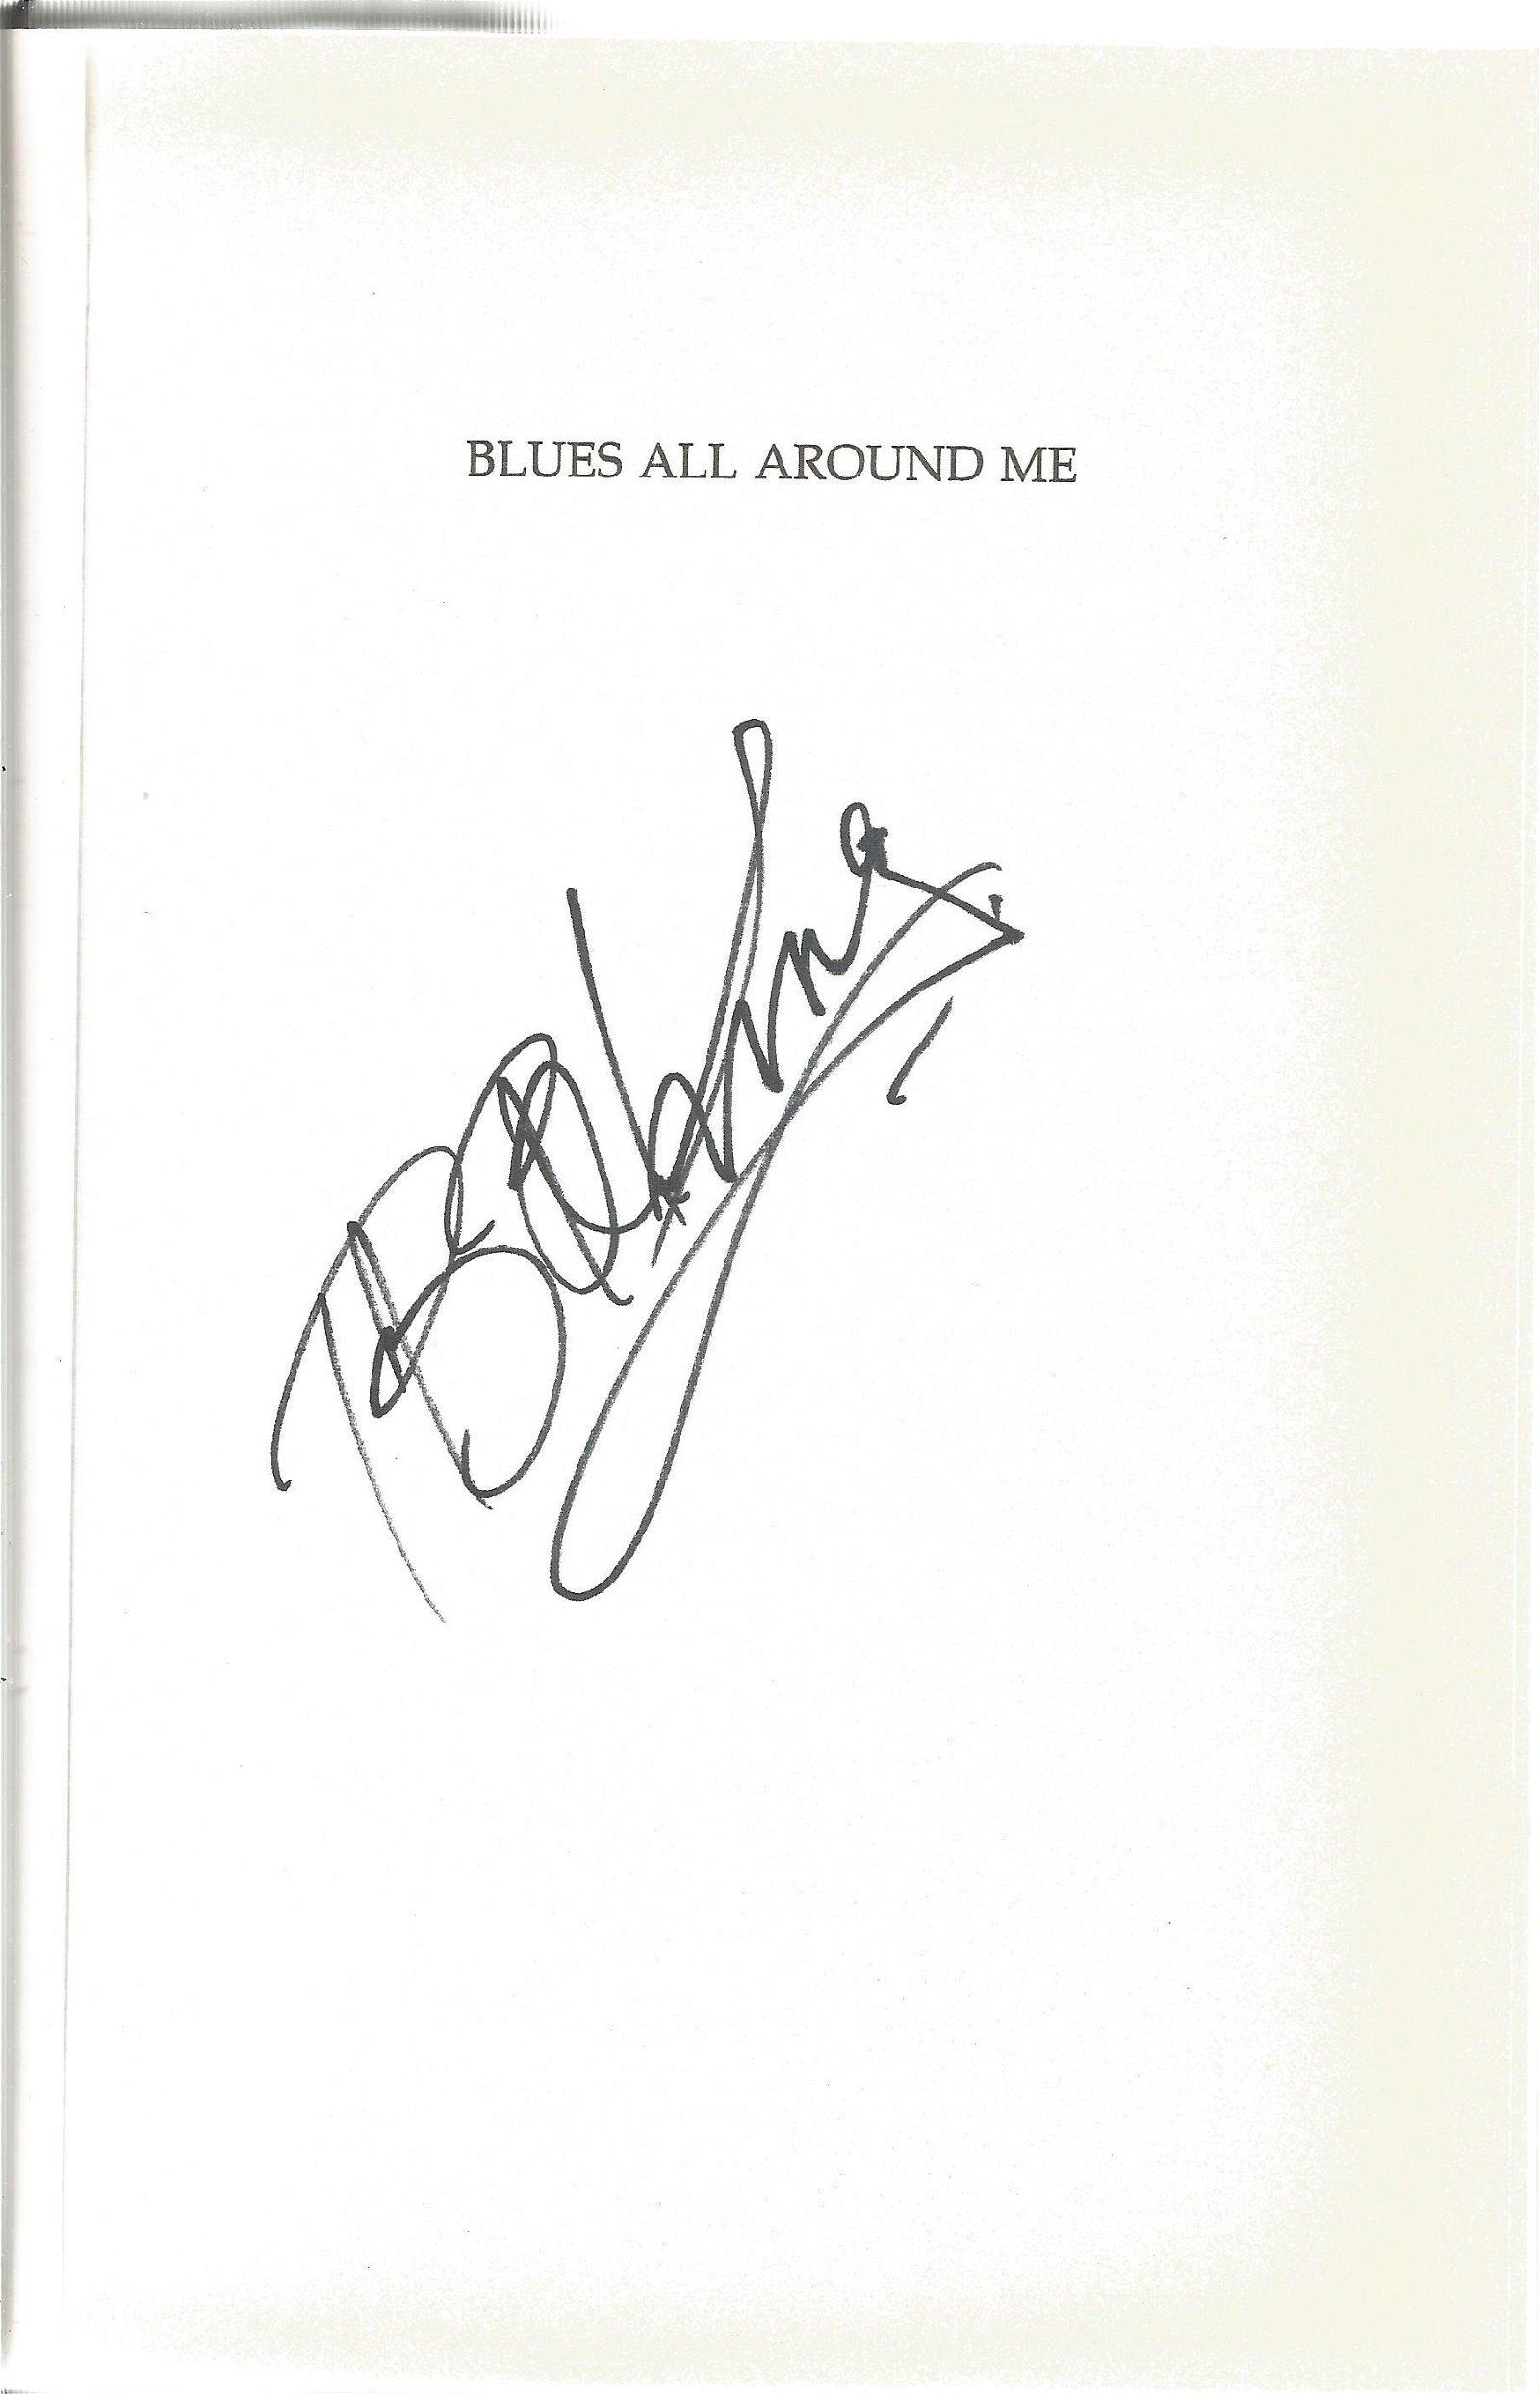 B. B King hardback book titled Blues All Around Me